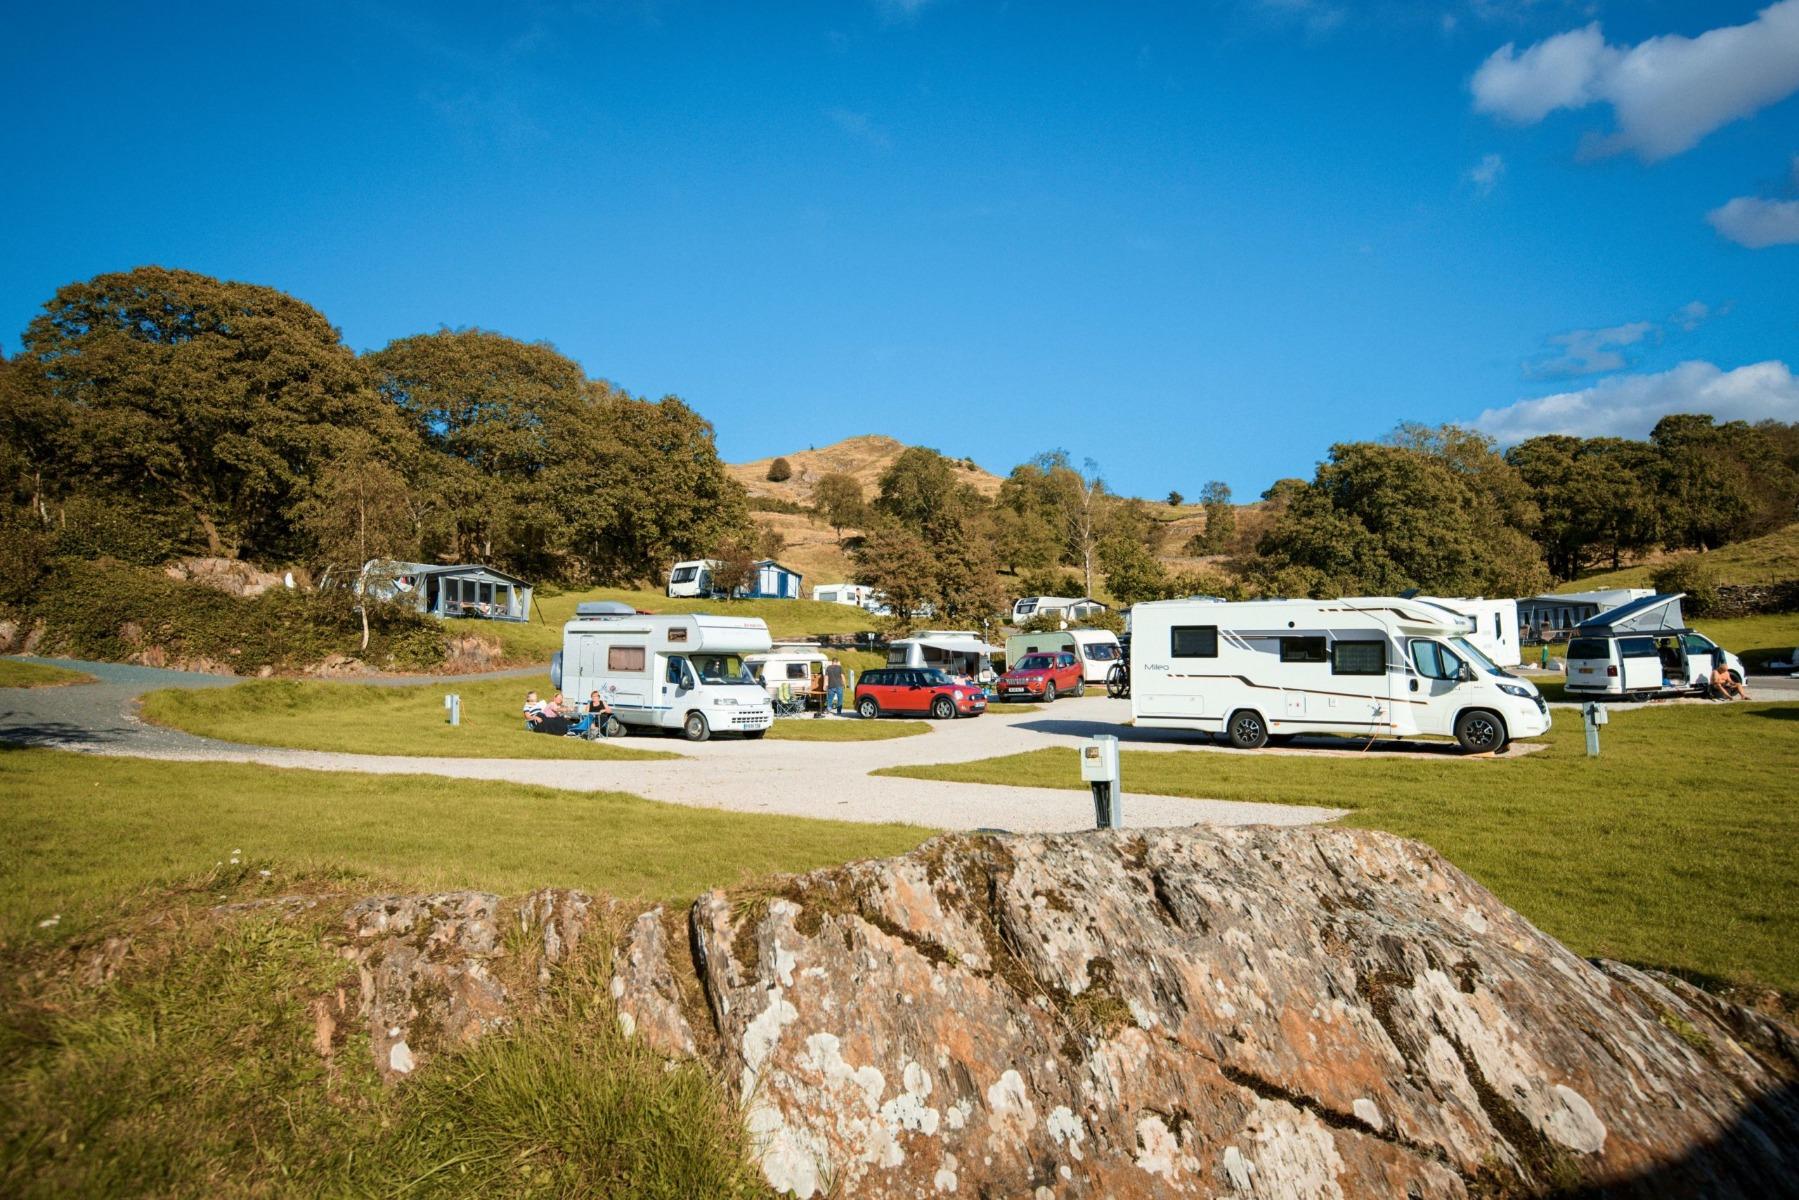 Park Cliffe Camping & Caravan Park